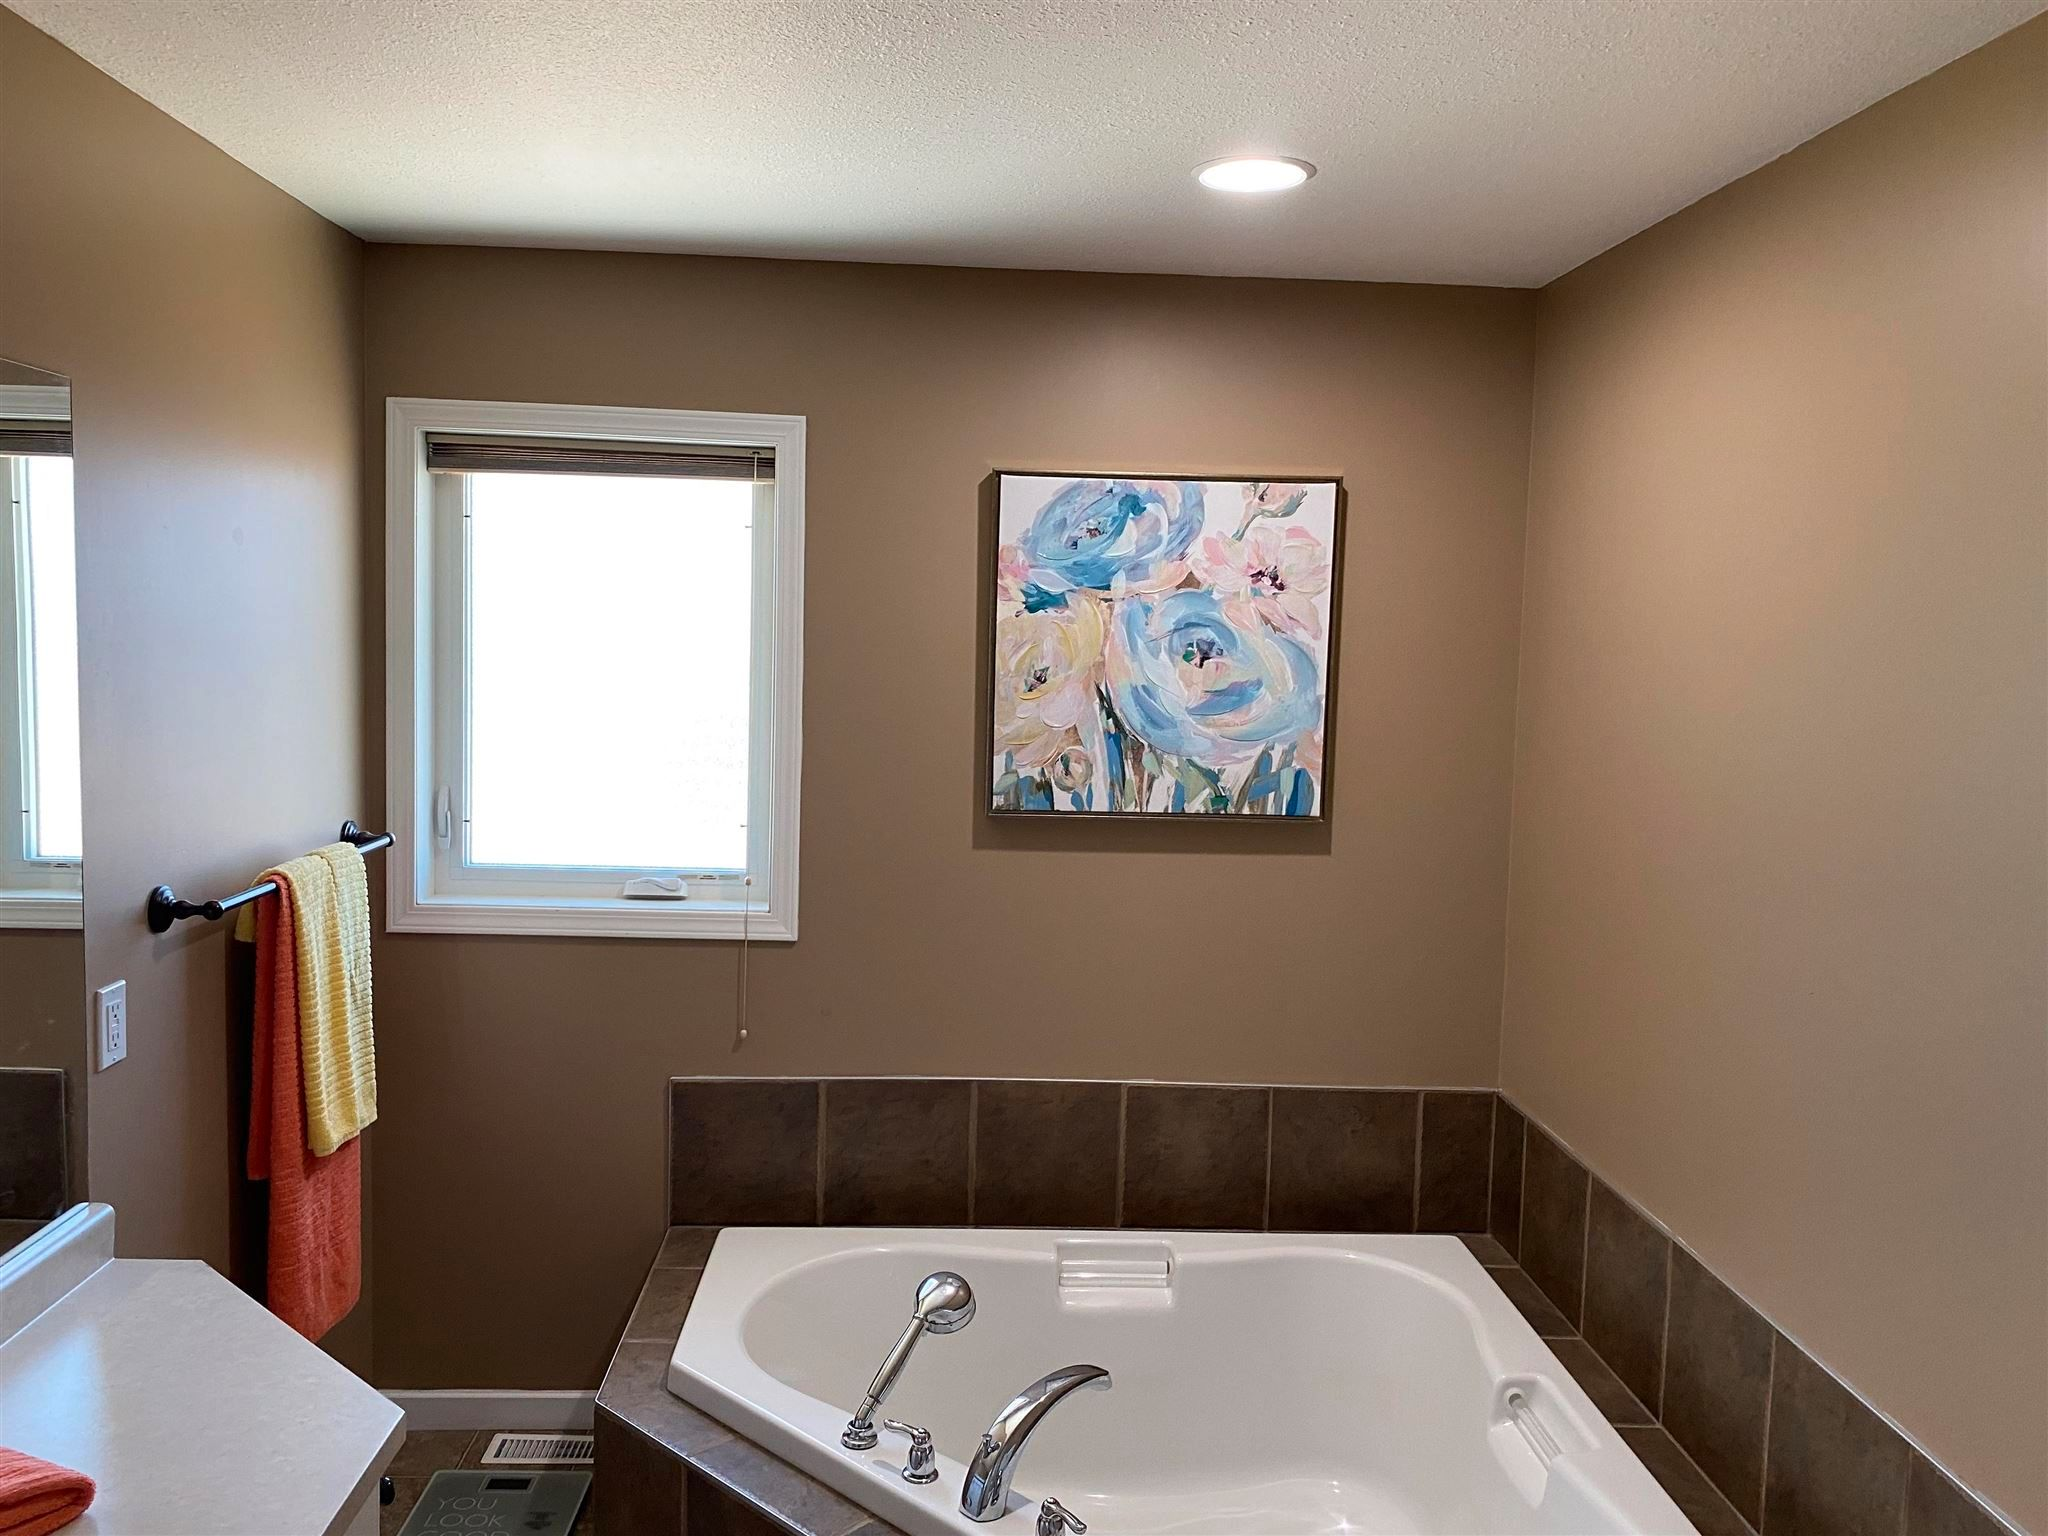 "Photo 10: Photos: 11327 86A Street in Fort St. John: Fort St. John - City NE House for sale in ""PANORAMA RIDGE"" (Fort St. John (Zone 60))  : MLS®# R2595967"